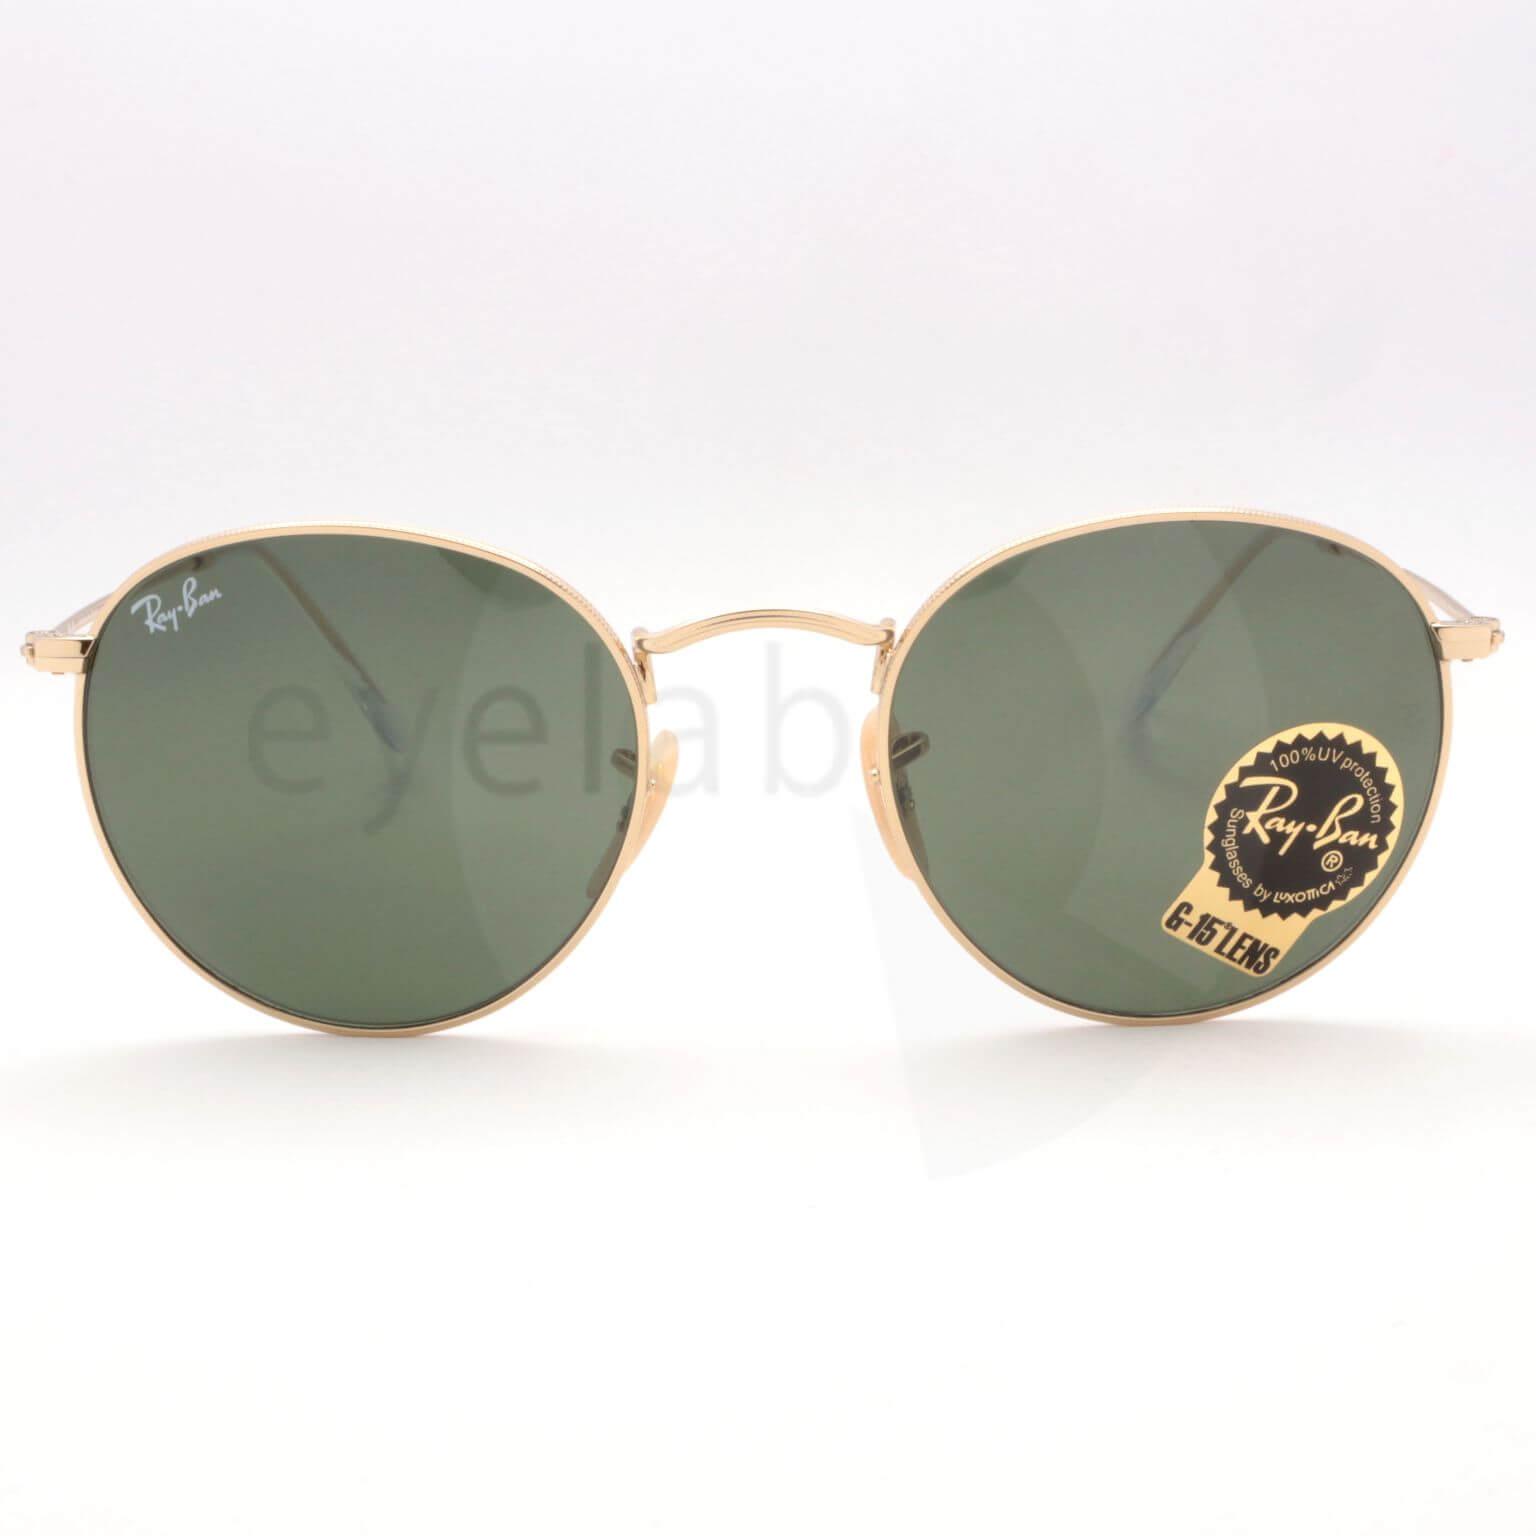 79d7831828 Γυαλιά ηλίου Ray-Ban 3447 Round Metal 001 ~ Eyelab